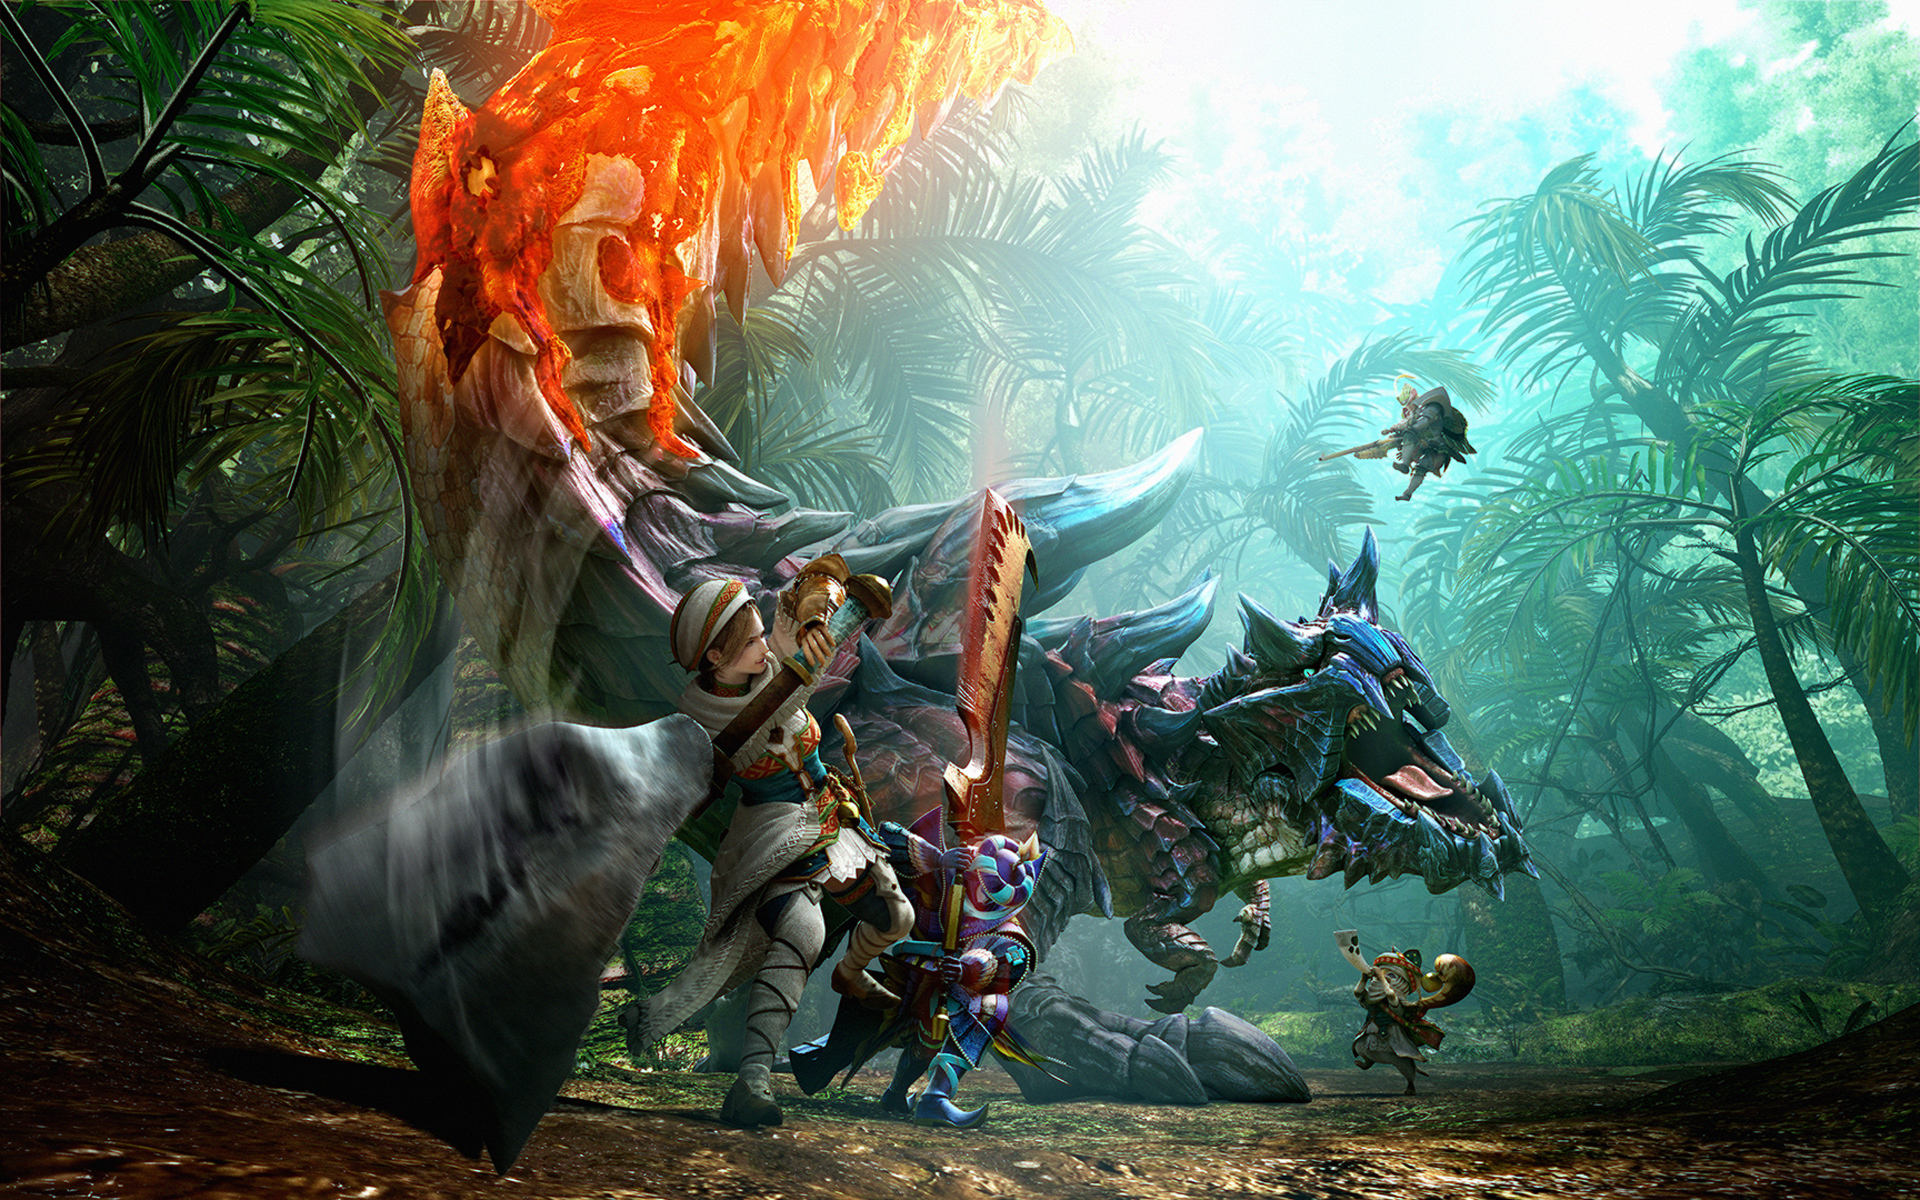 Monster Hunter World 4k Wallpaper: Monster Hunter Generations Key Art, HD Games, 4k